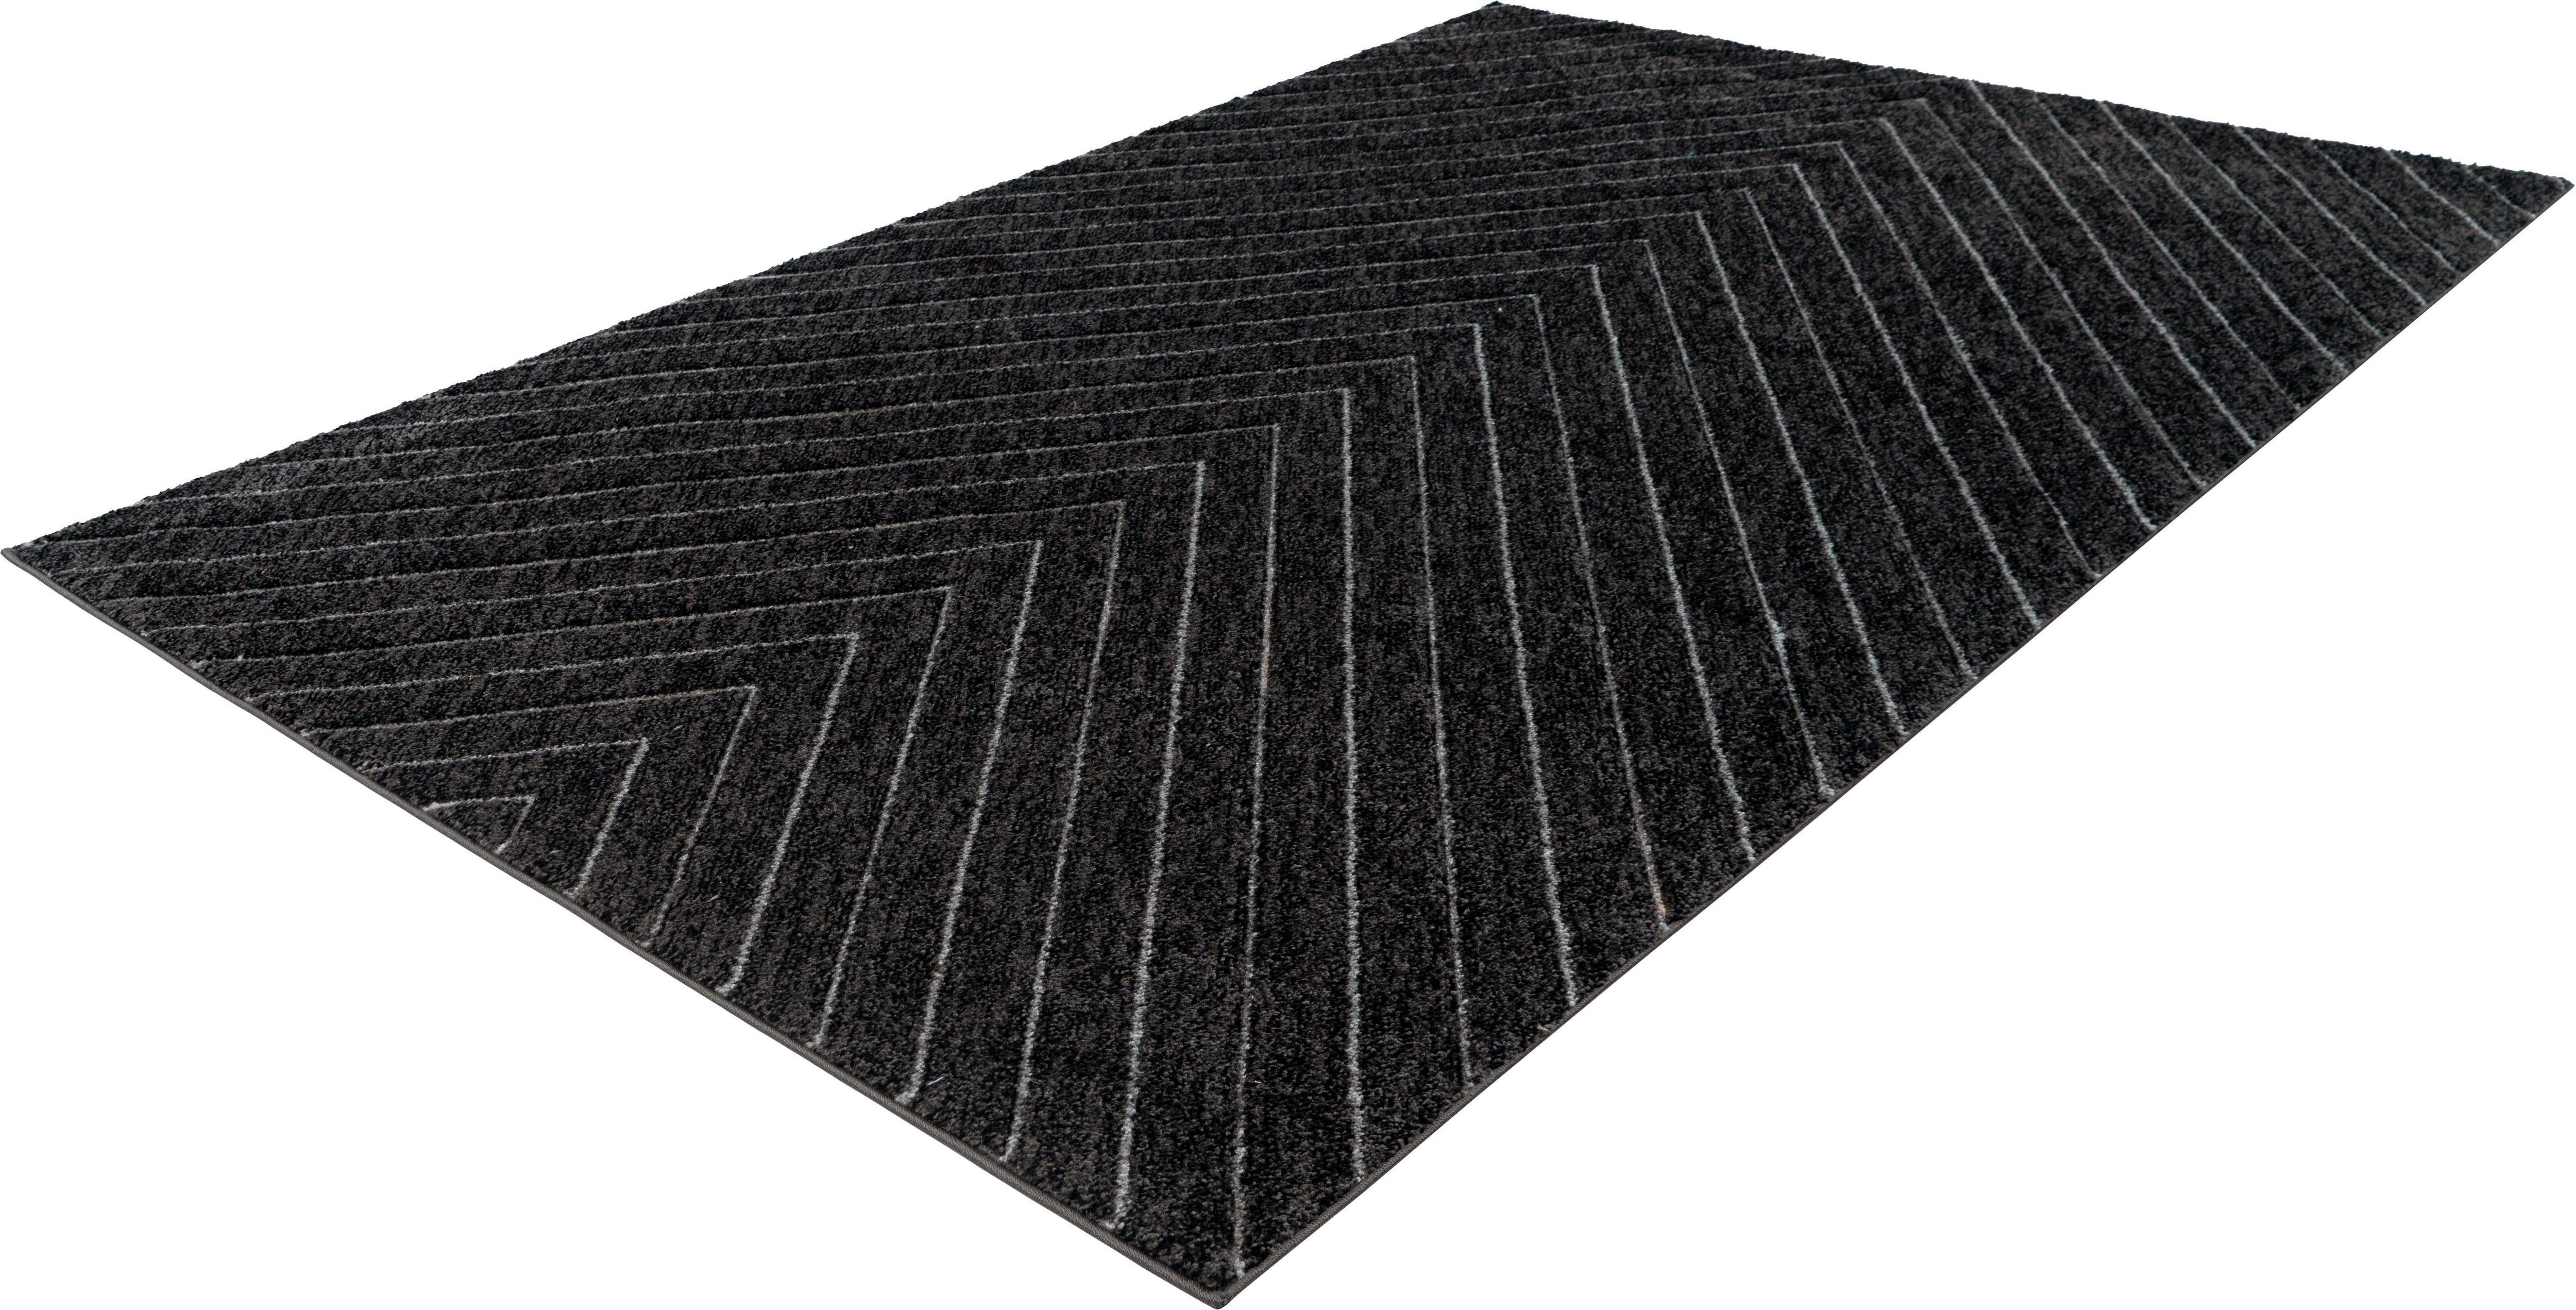 Teppich Astro 302 calo-deluxe rechteckig Höhe 14 mm maschinell gewebt